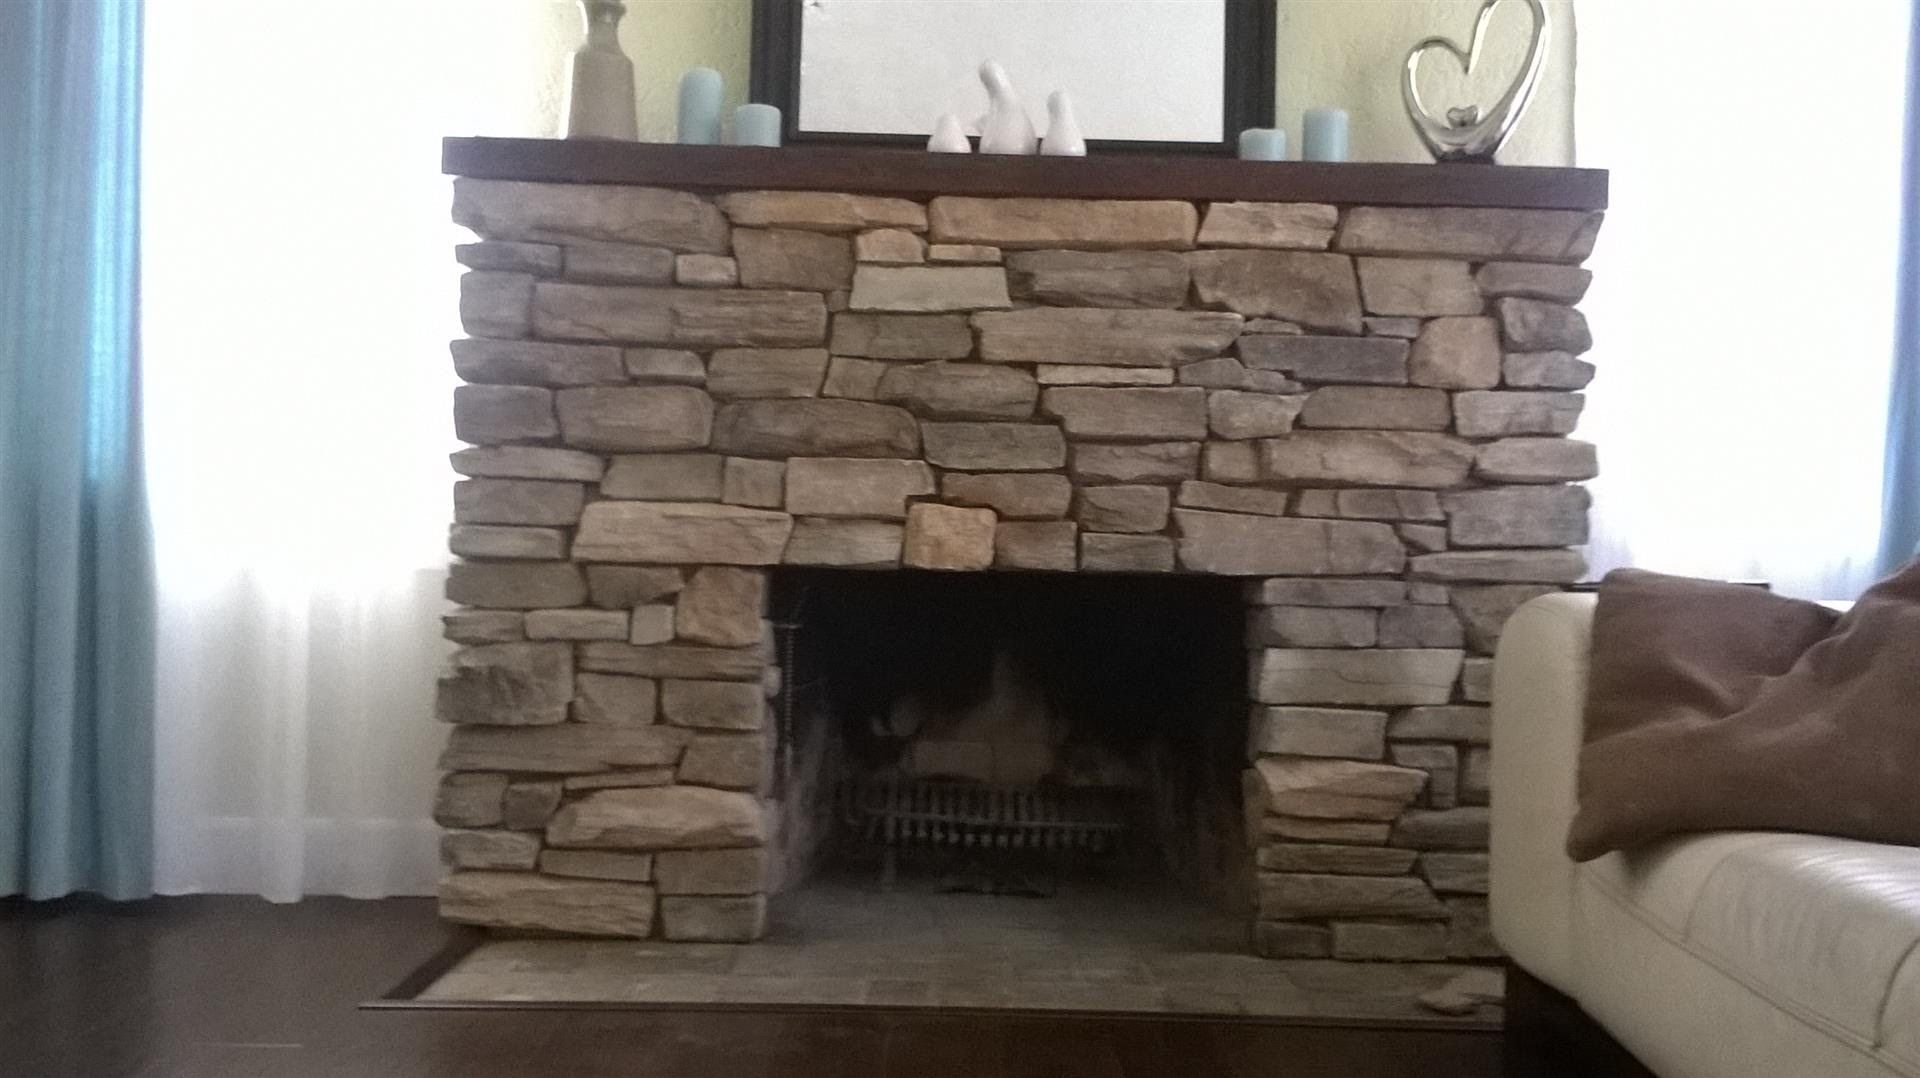 Install Stone Veneers Over Old Brick Fireplace Diy Youtube